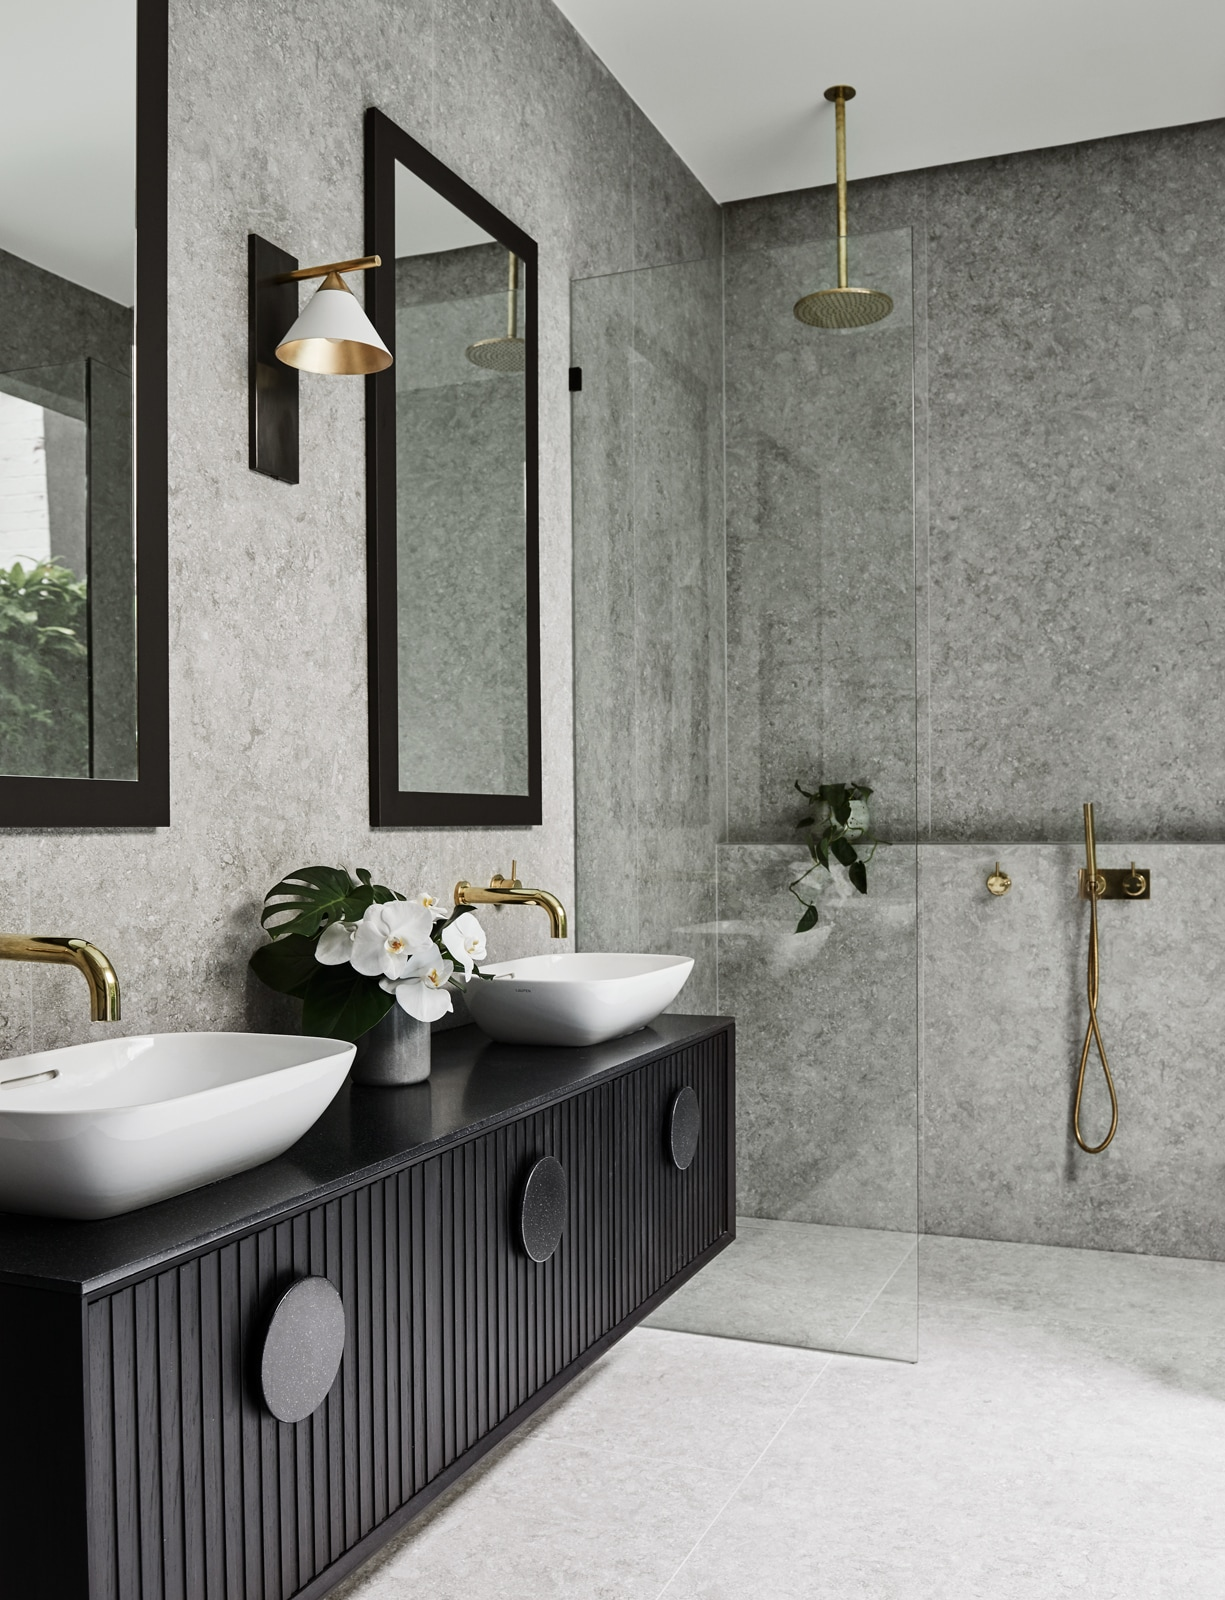 10 stunning stone tile bathroom designs